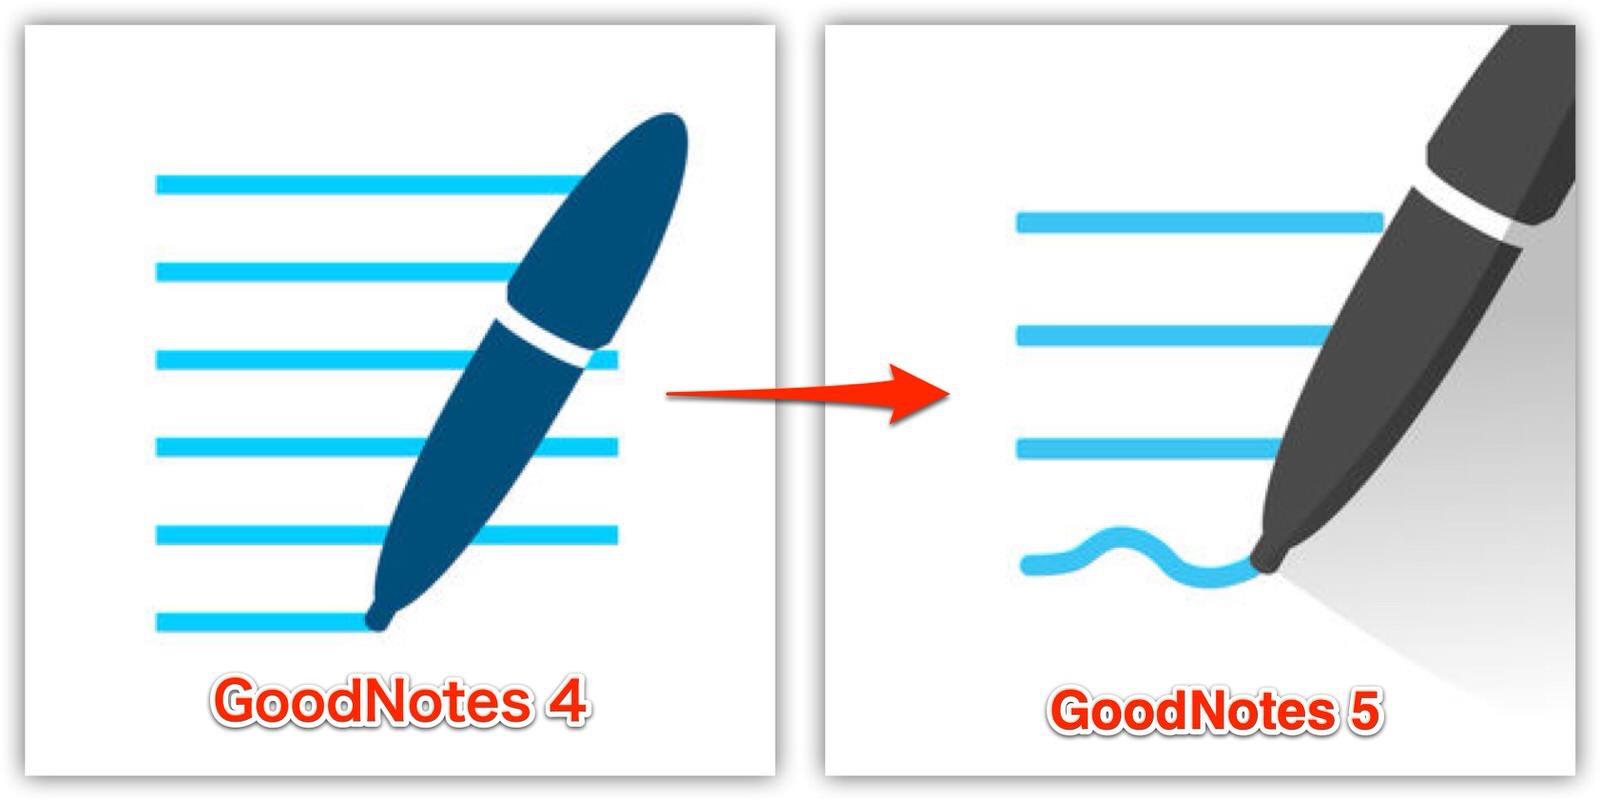 GoodNotes 4 - GoodNotes 5